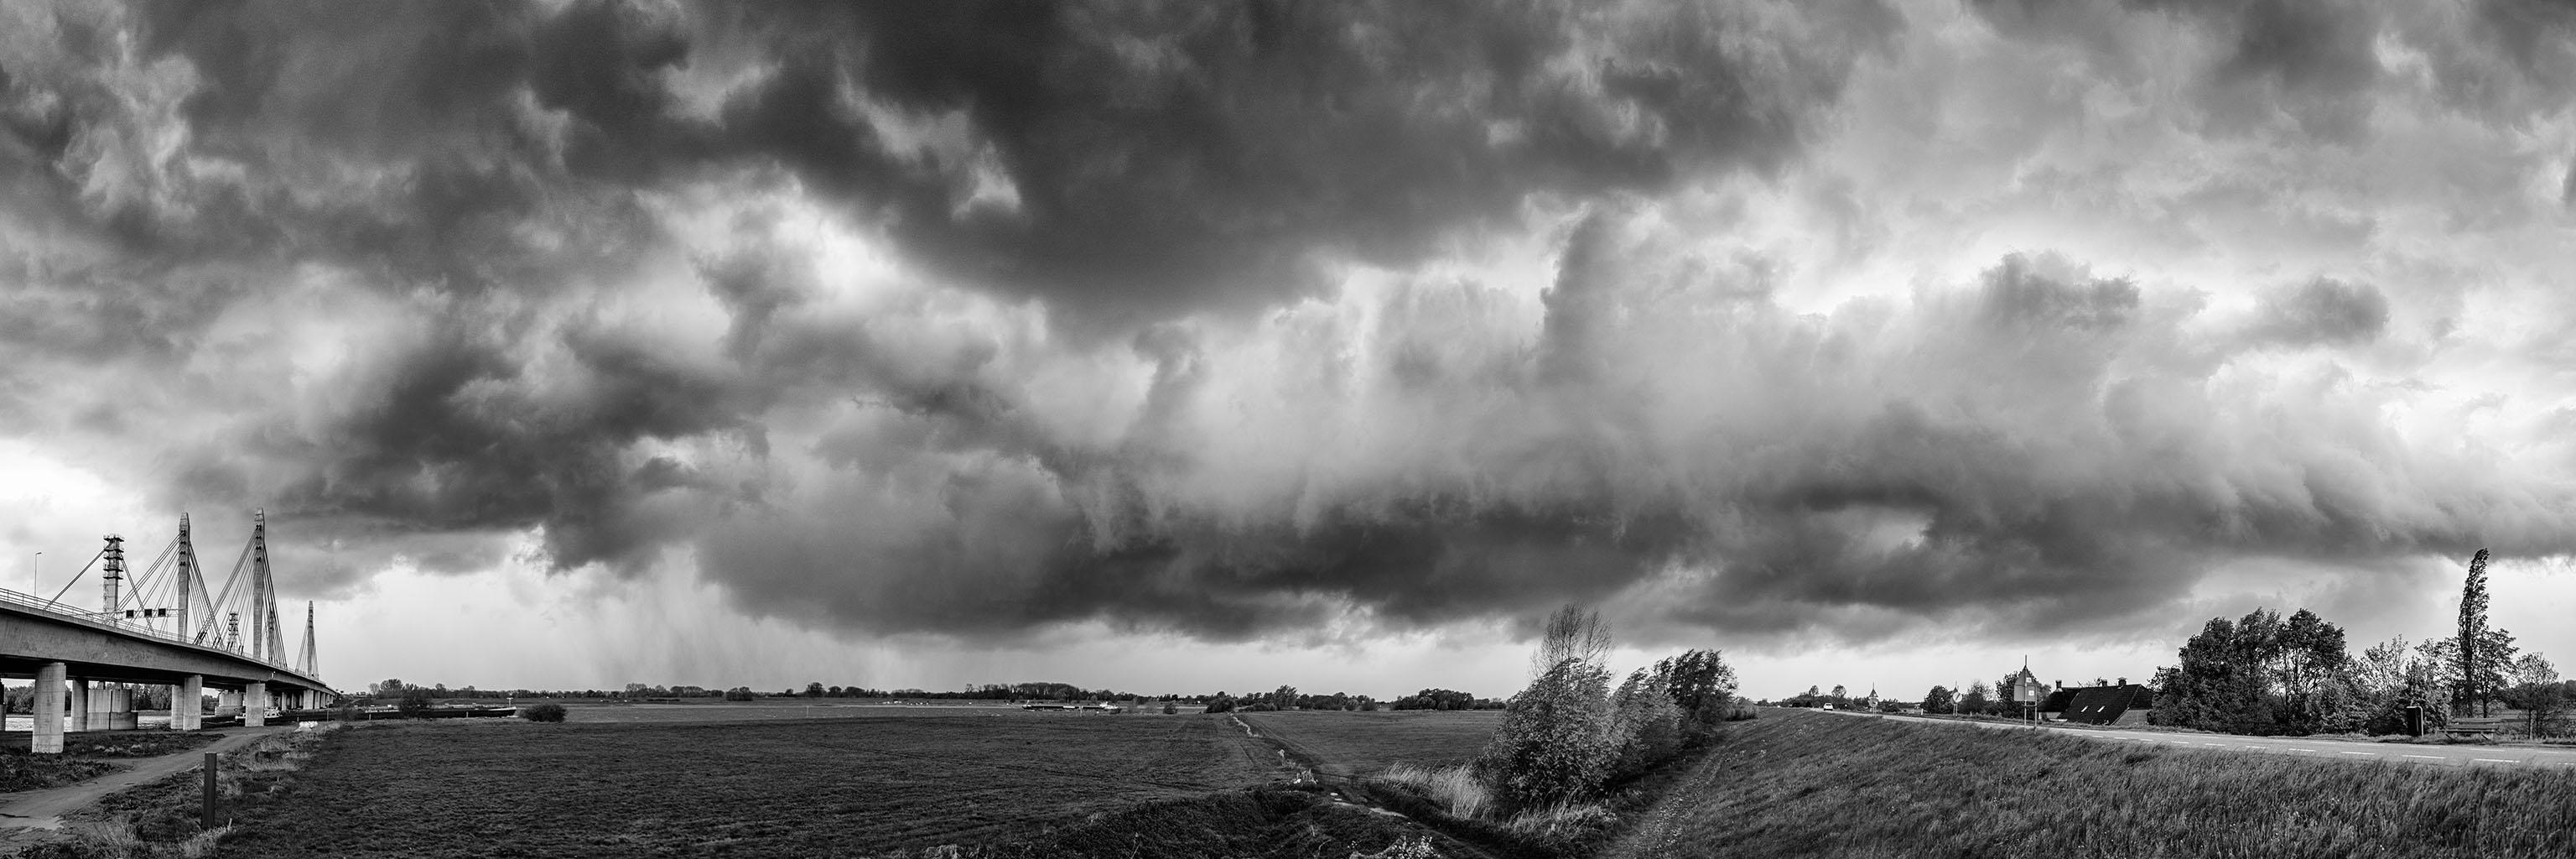 Storm 5-5-2015 black 12